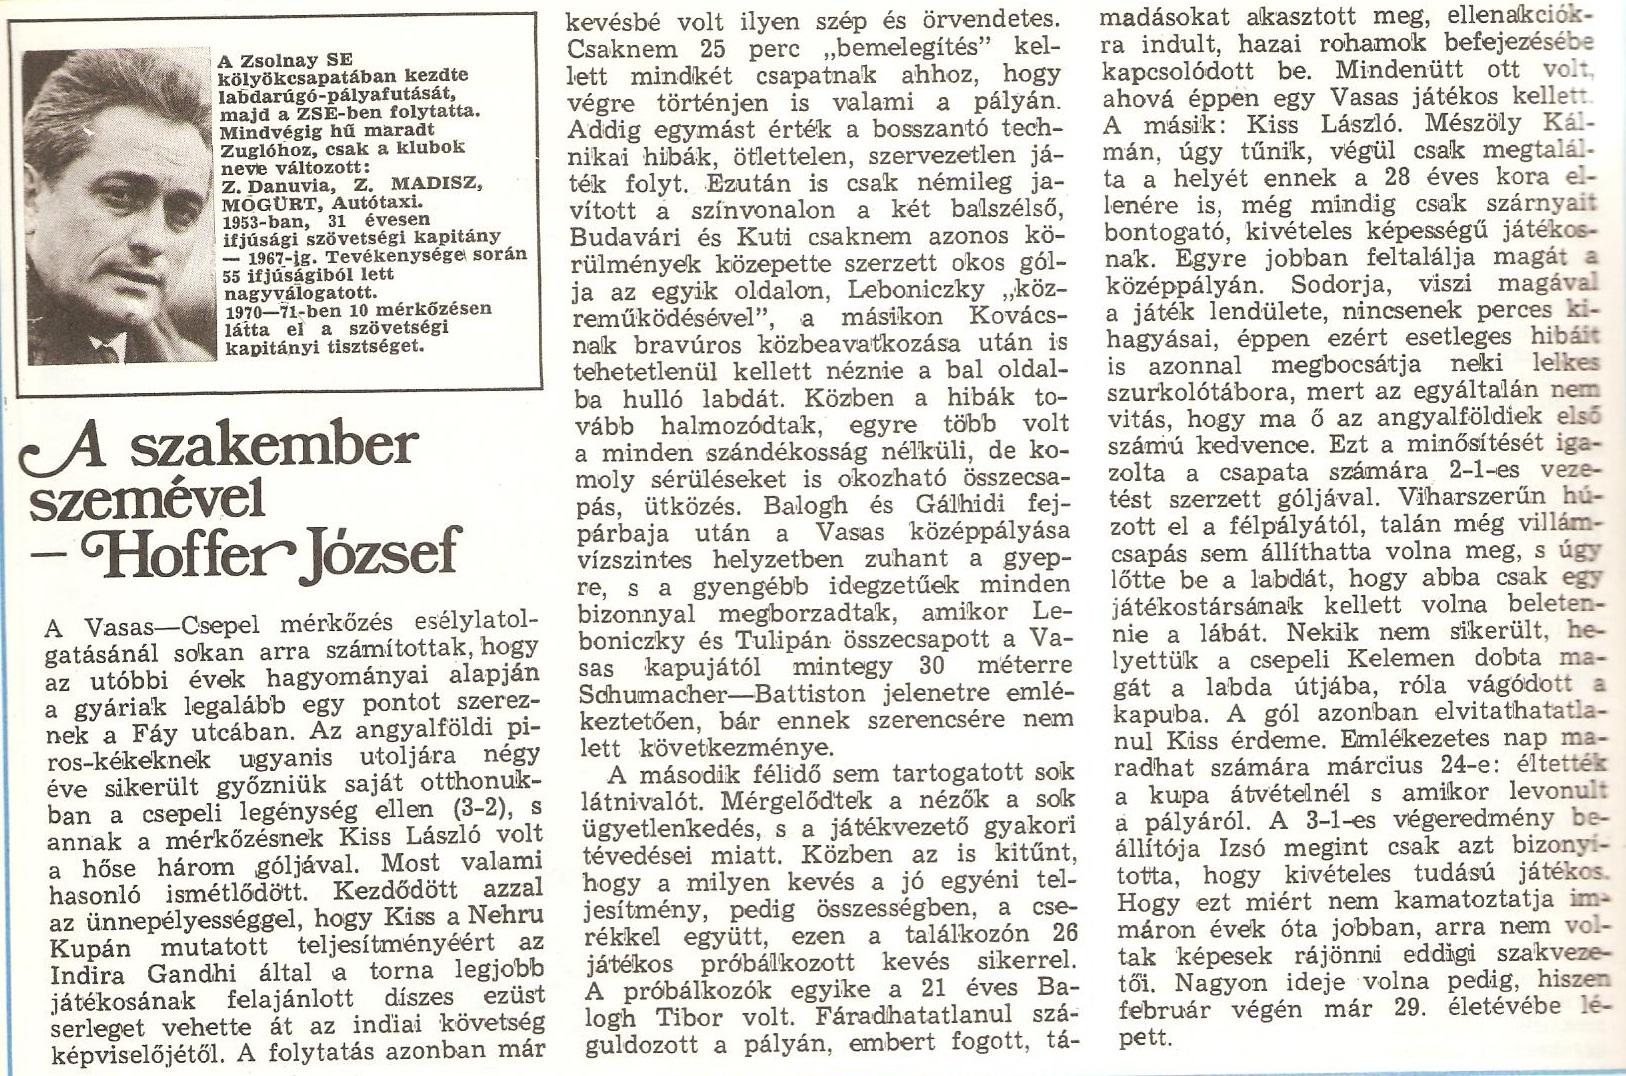 Idokapszula_nb1_1983-84_19_fordulo_szakerto.jpg